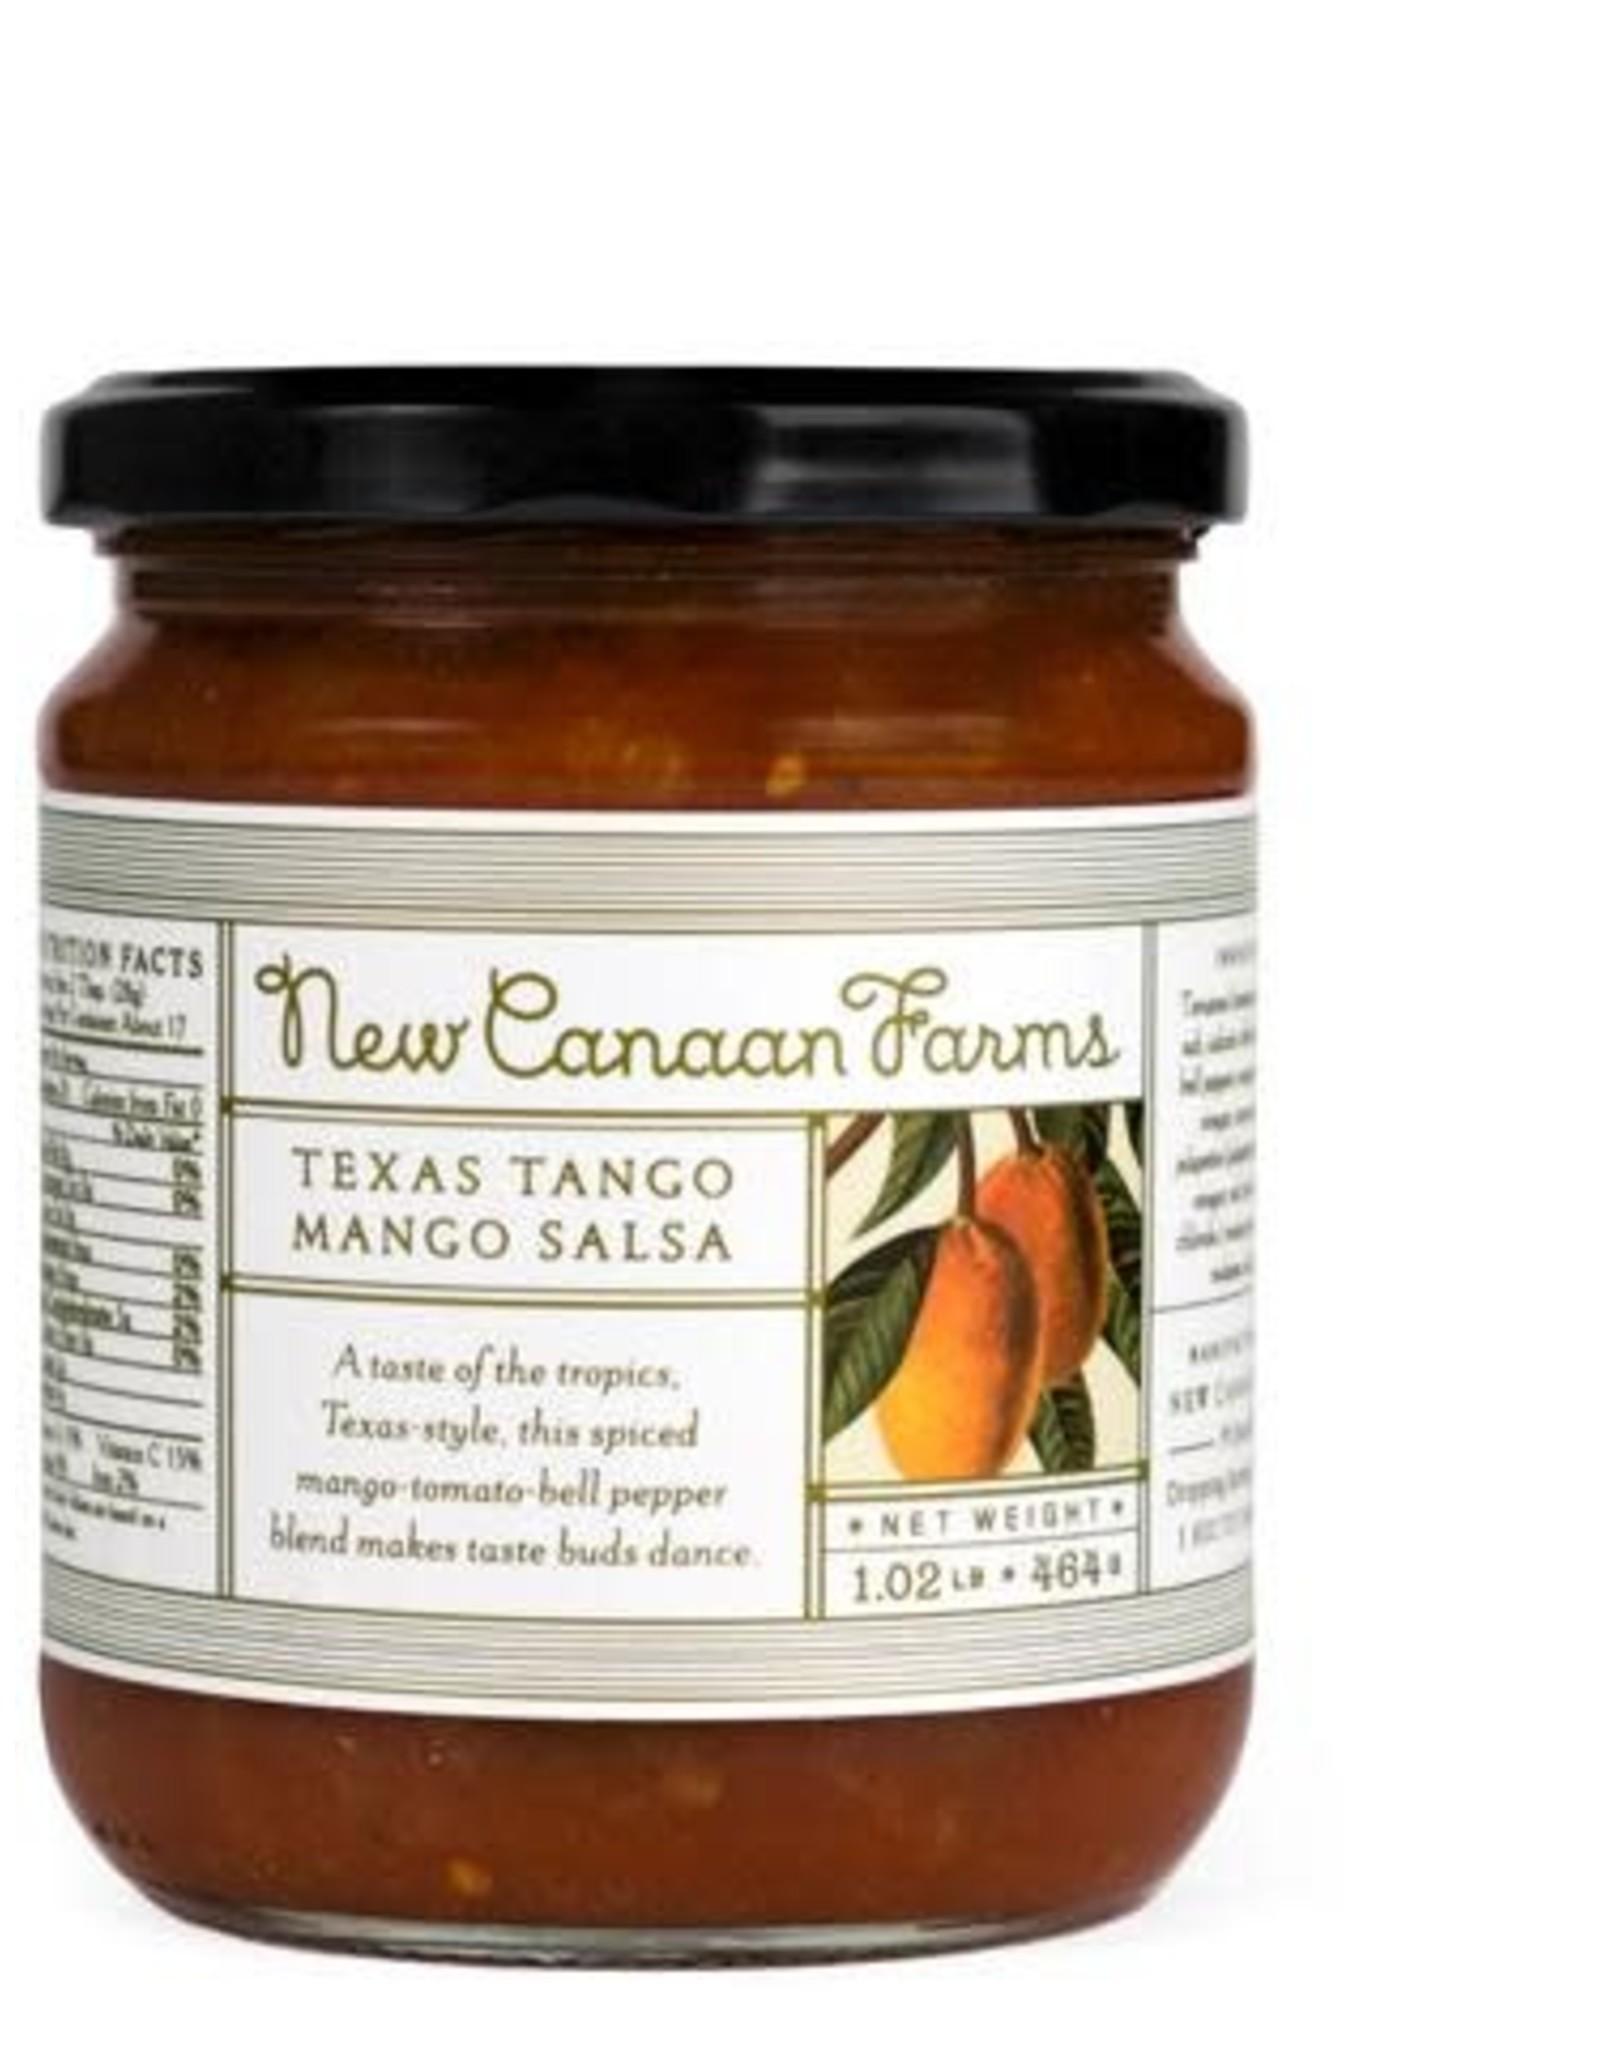 Texas Tango Mango Salsa